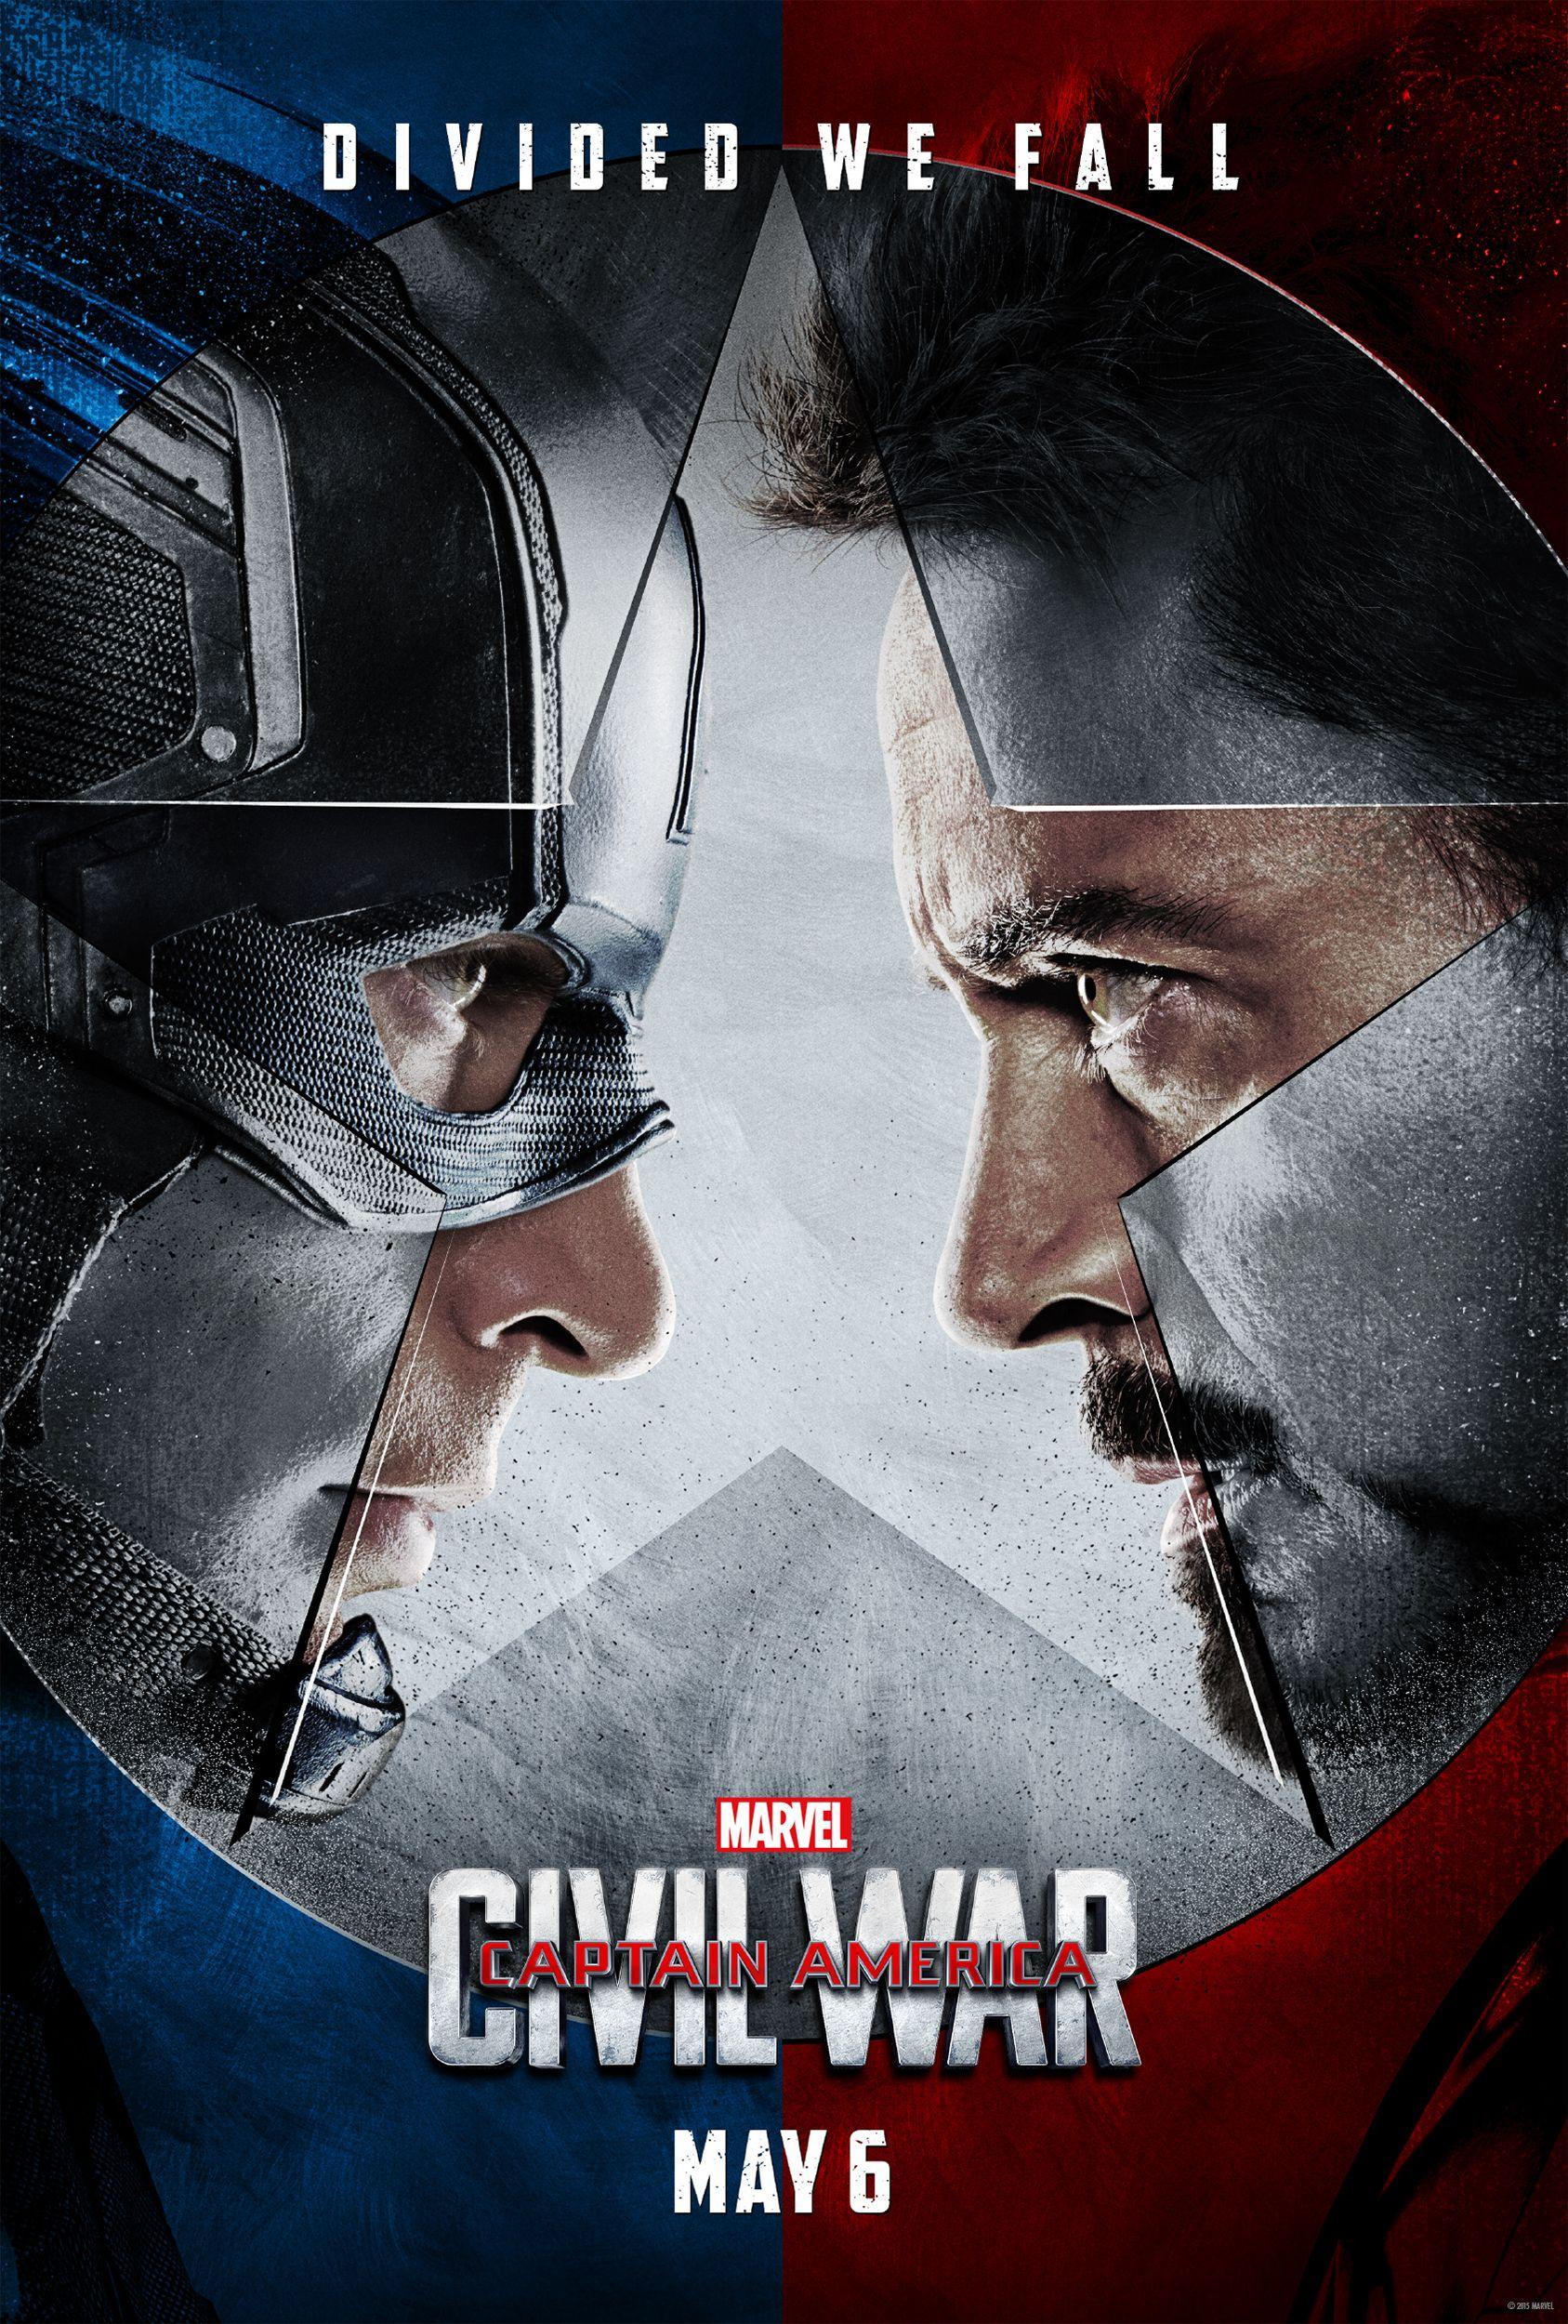 Captain America Civil War Trailer World Premiere Robert Downey Jr Superhelden Filme Kostenlos